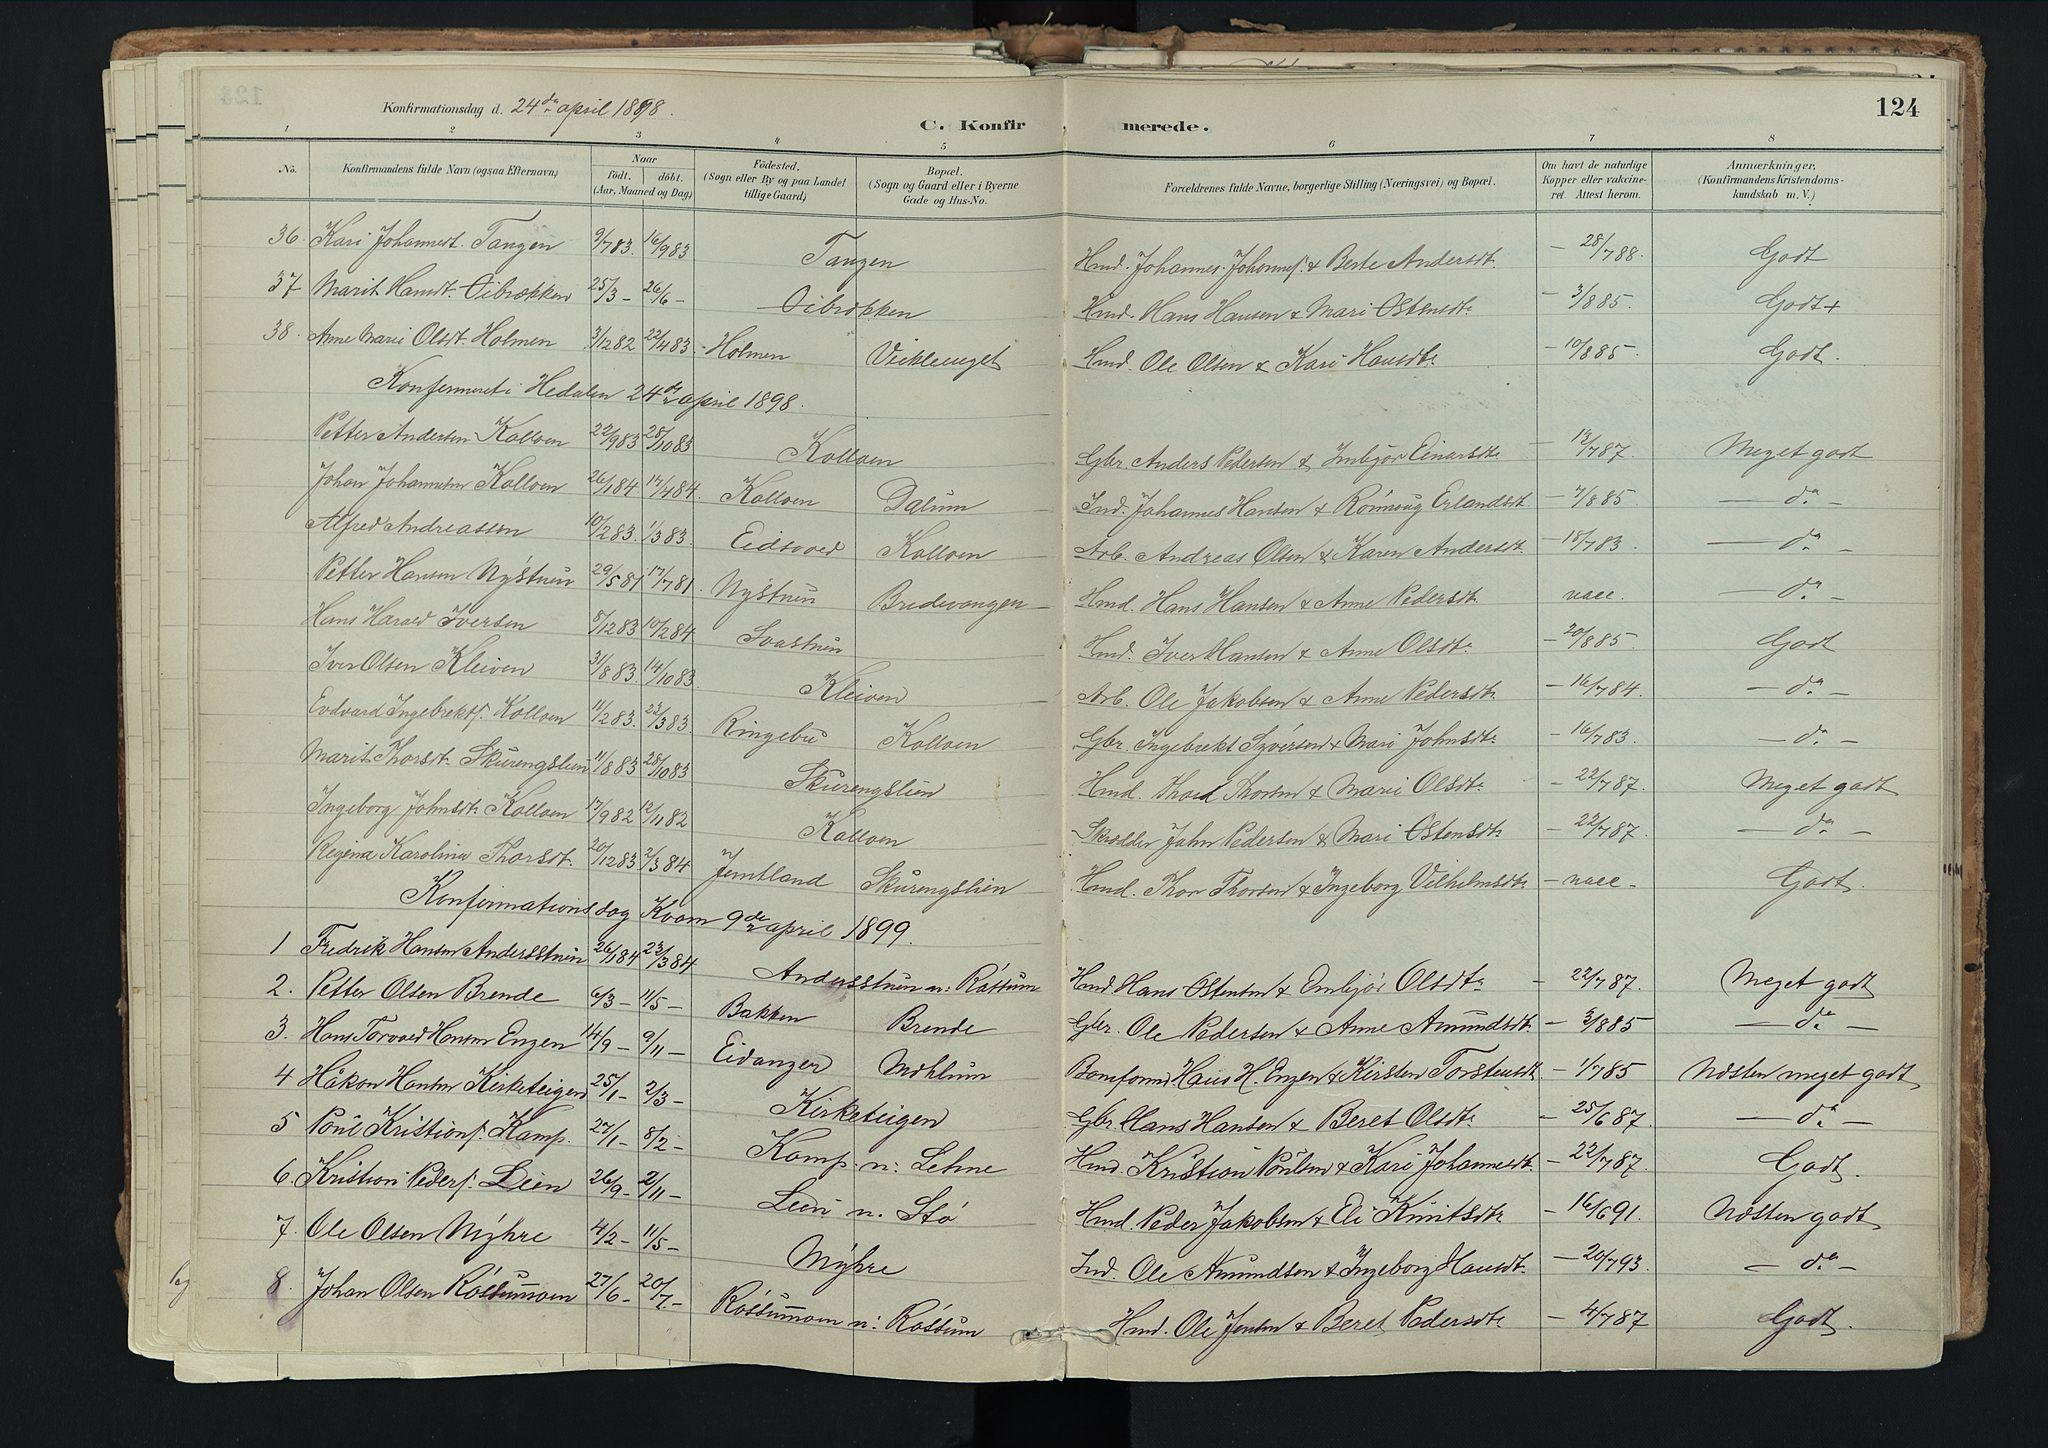 SAH, Nord-Fron prestekontor, Ministerialbok nr. 3, 1884-1914, s. 124